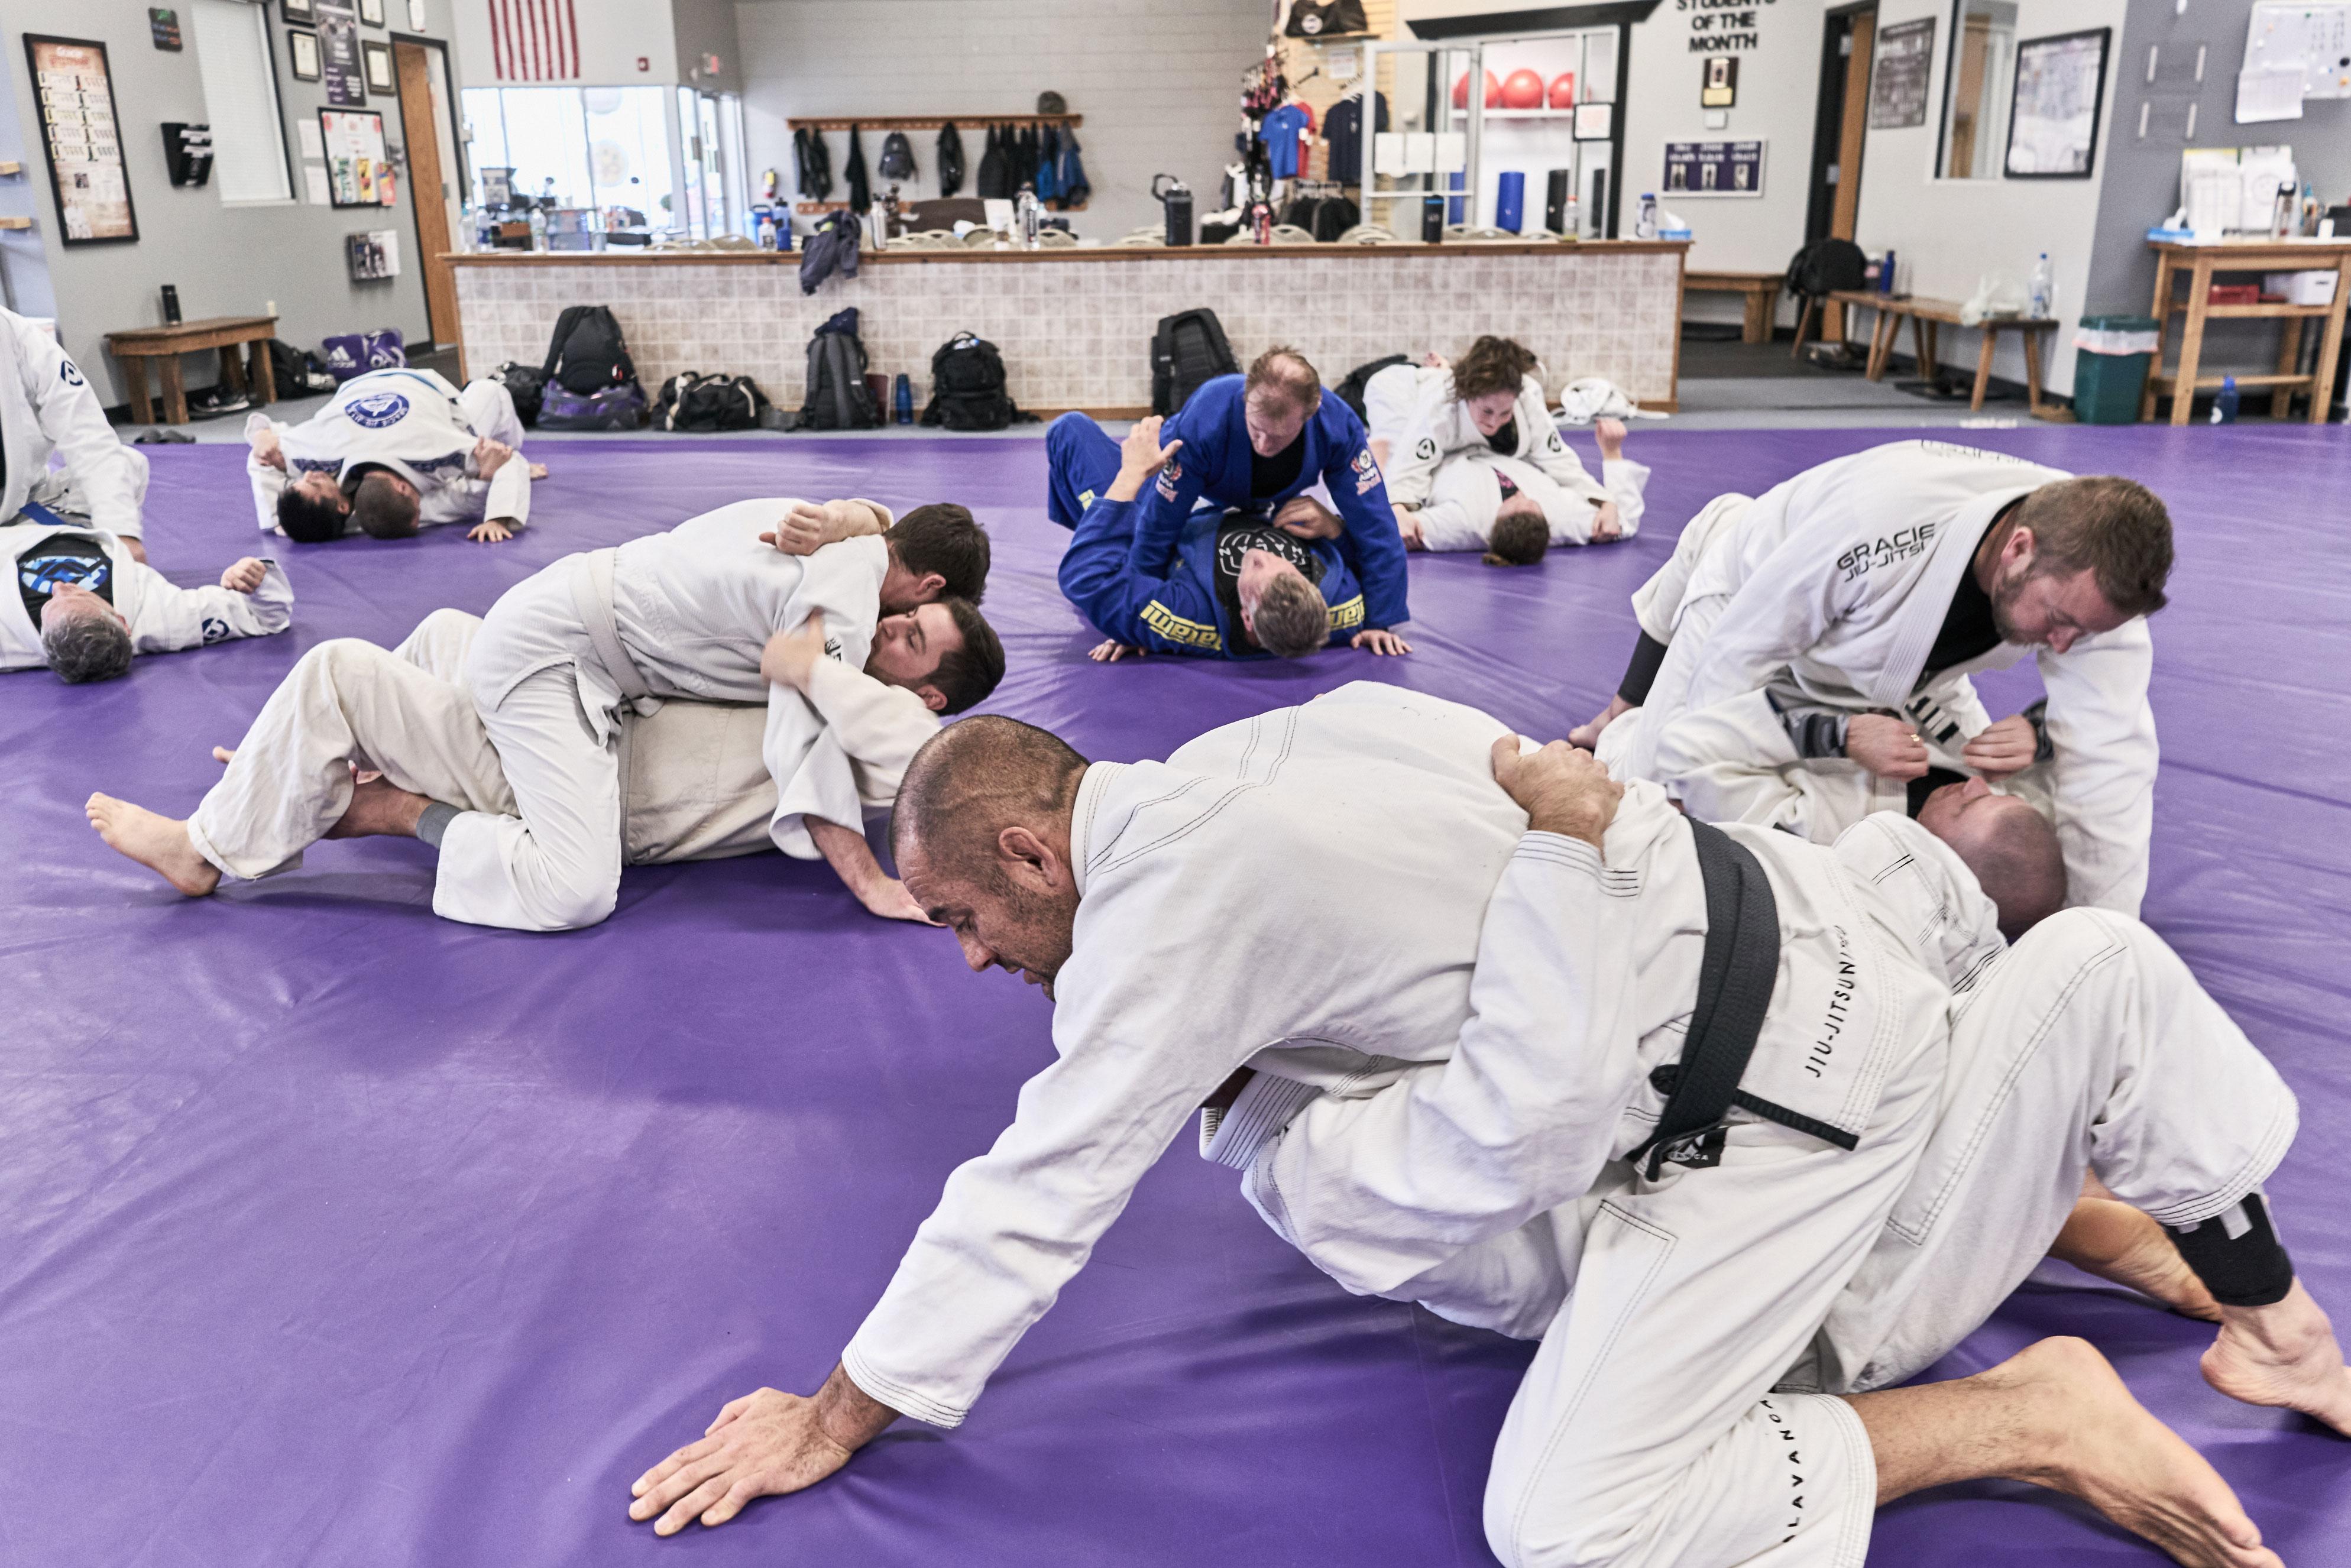 Black belt jui jitsu instructor working with student during seminar